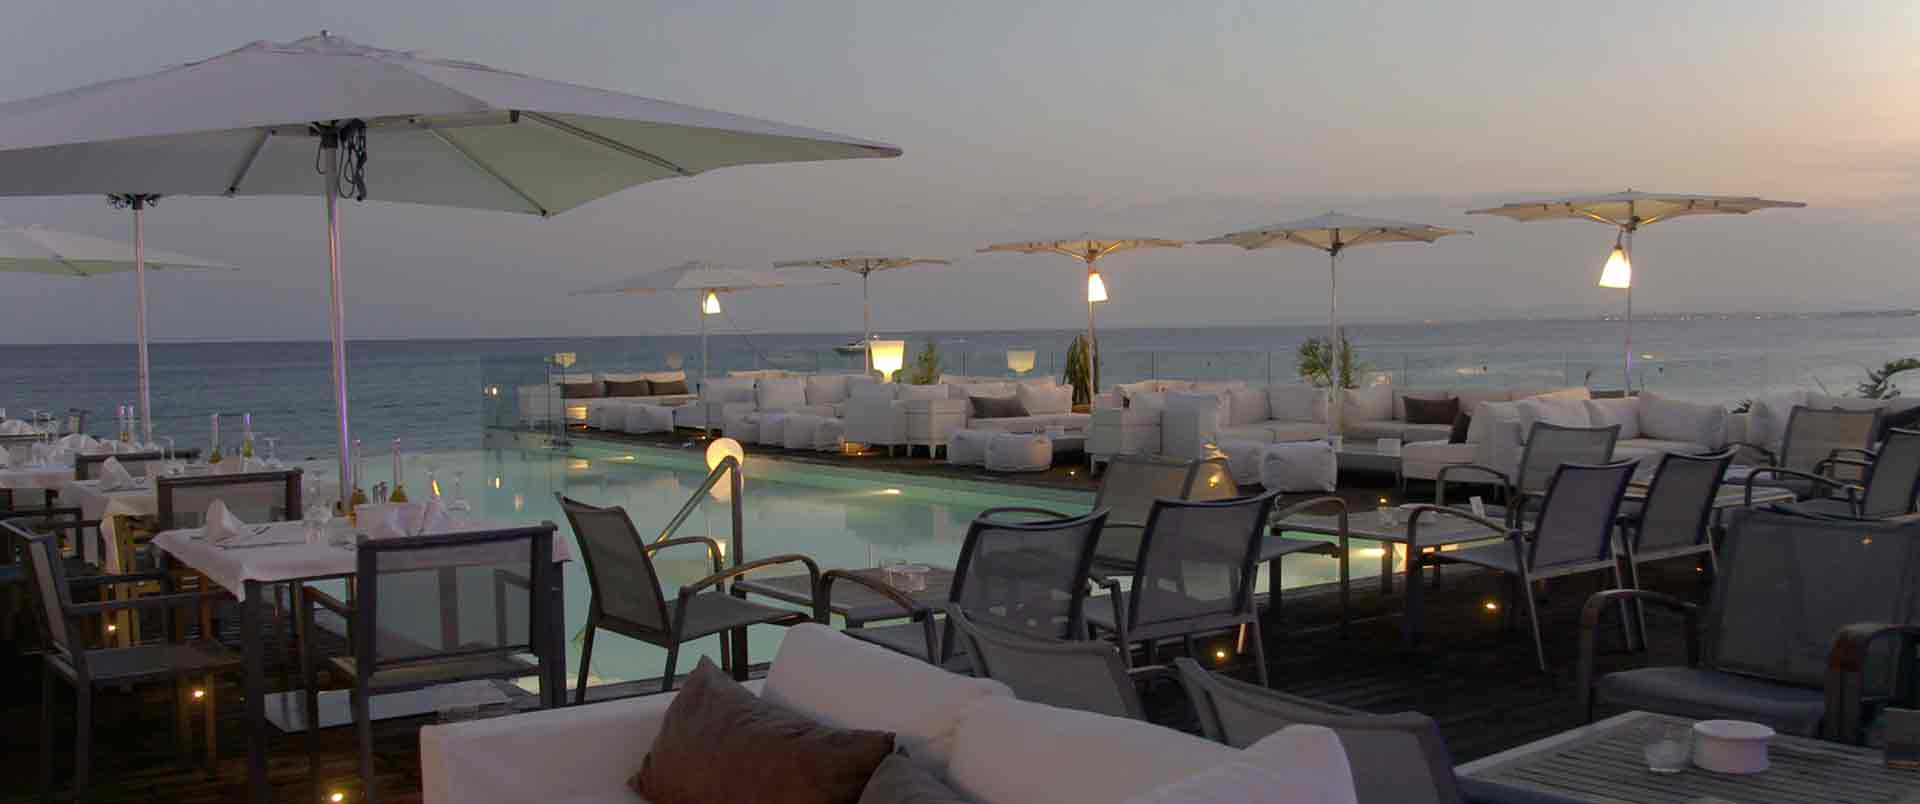 Sinbad Hotel, Hammamet